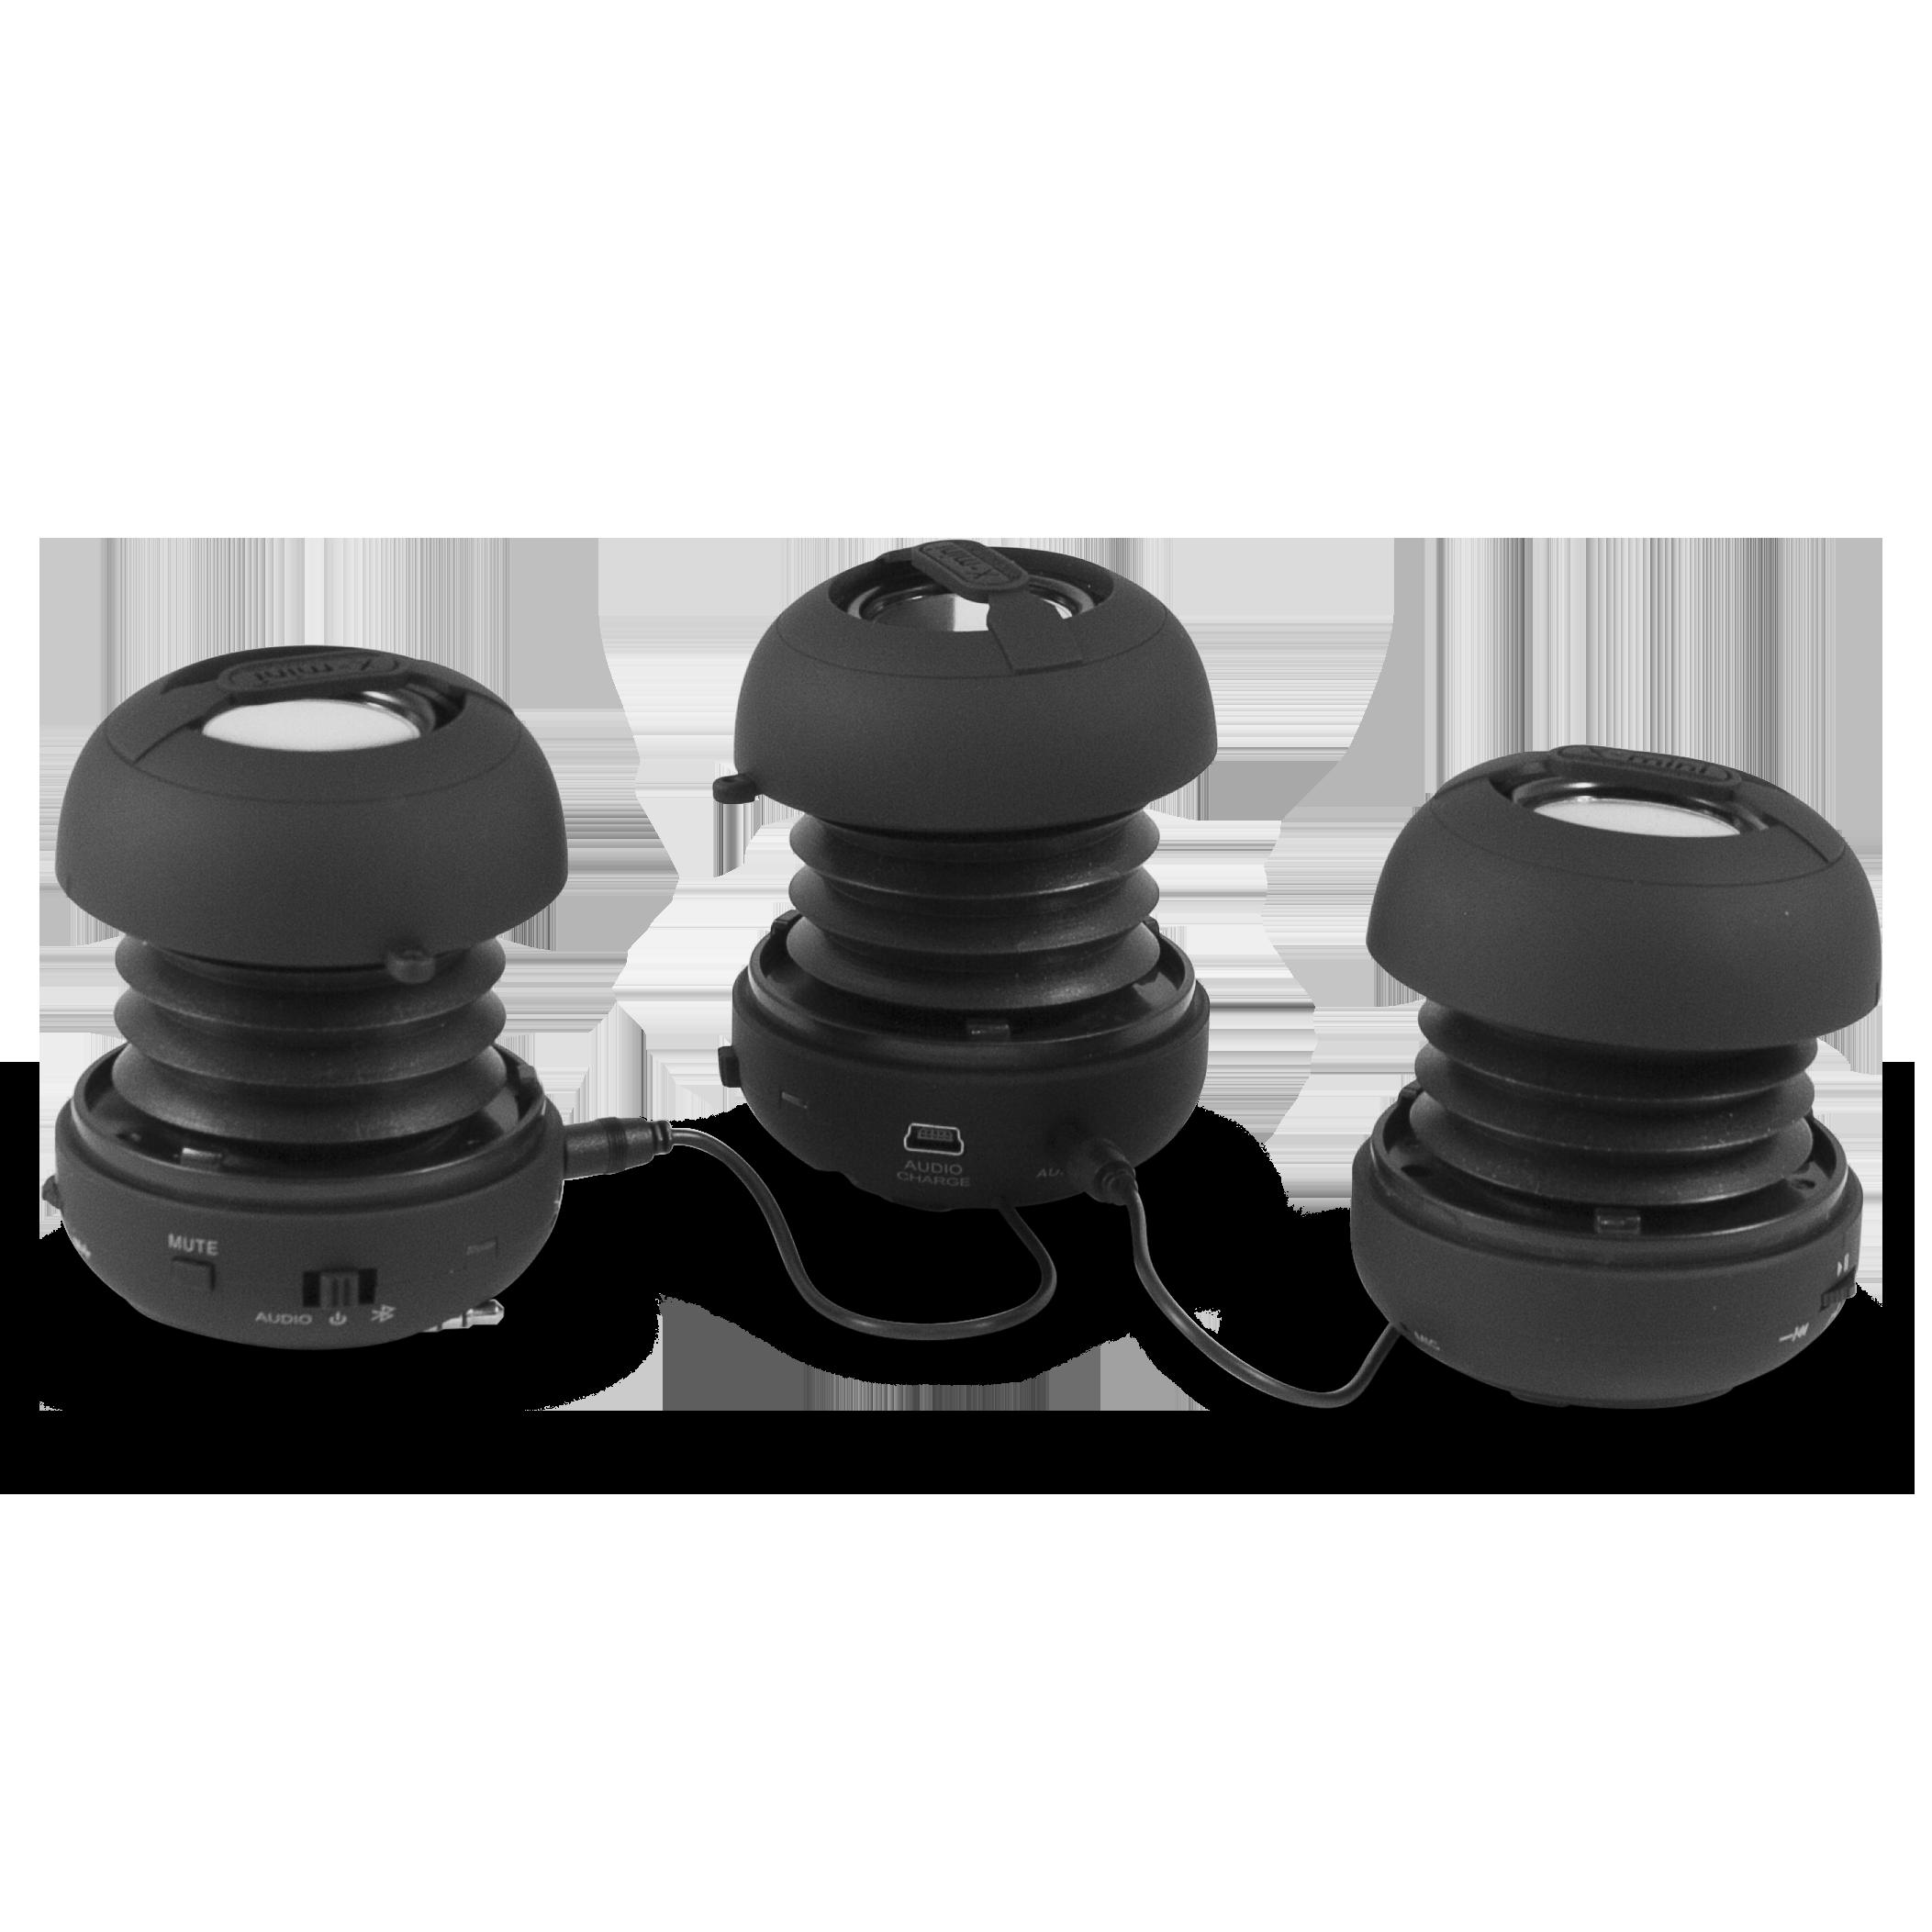 conran audio speaker dock manual